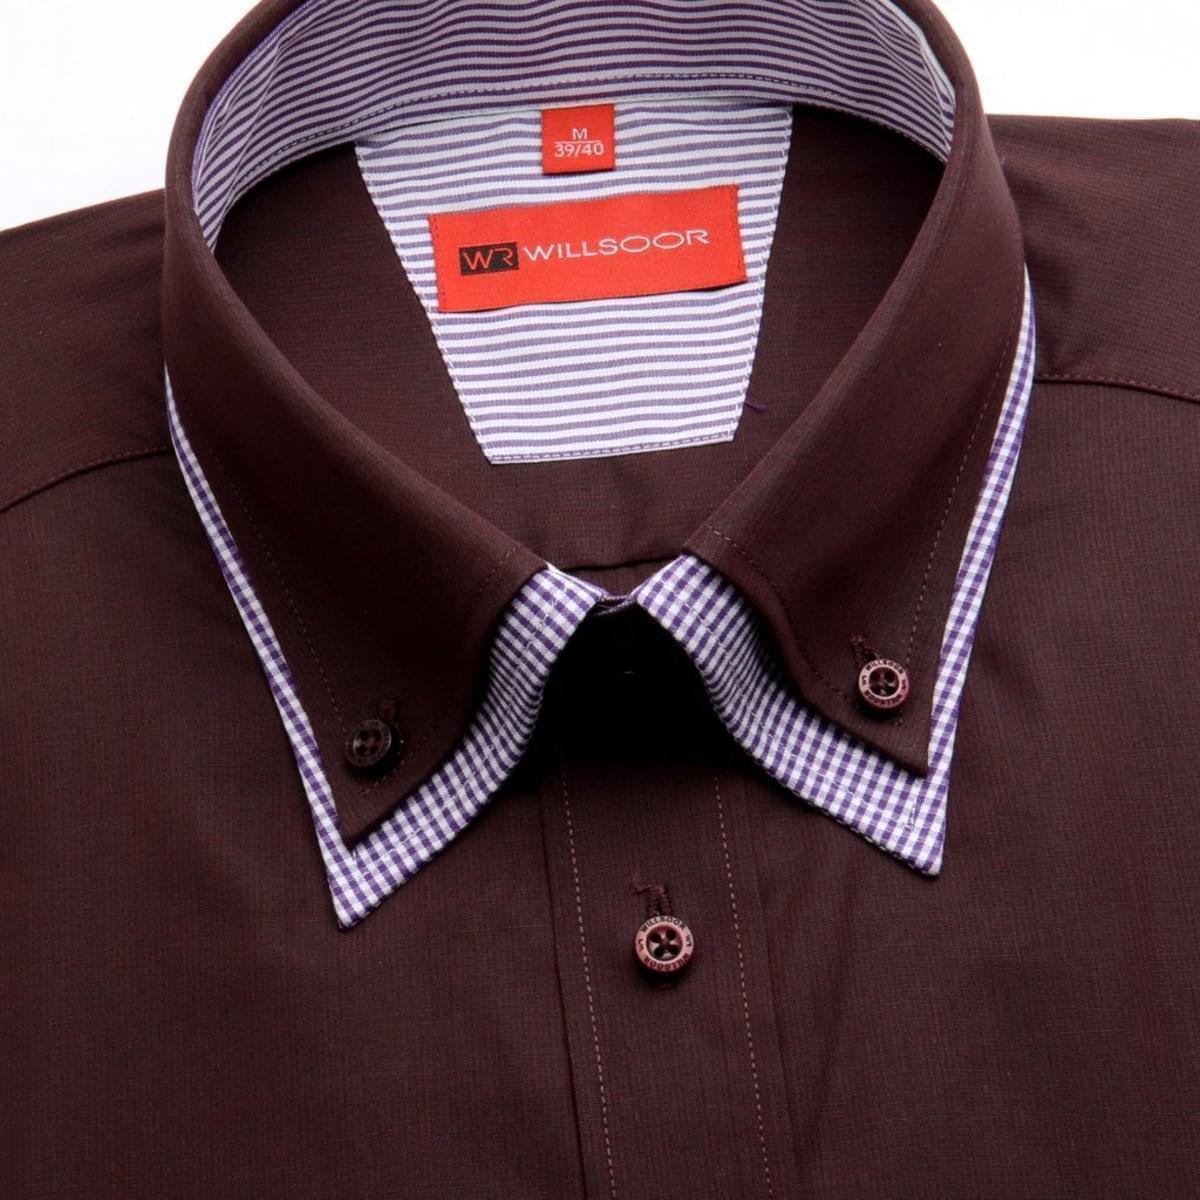 Willsoor Pánska košeľa WR Slim Fit (výška 164-170) 1682 164-170 / L (41/42)